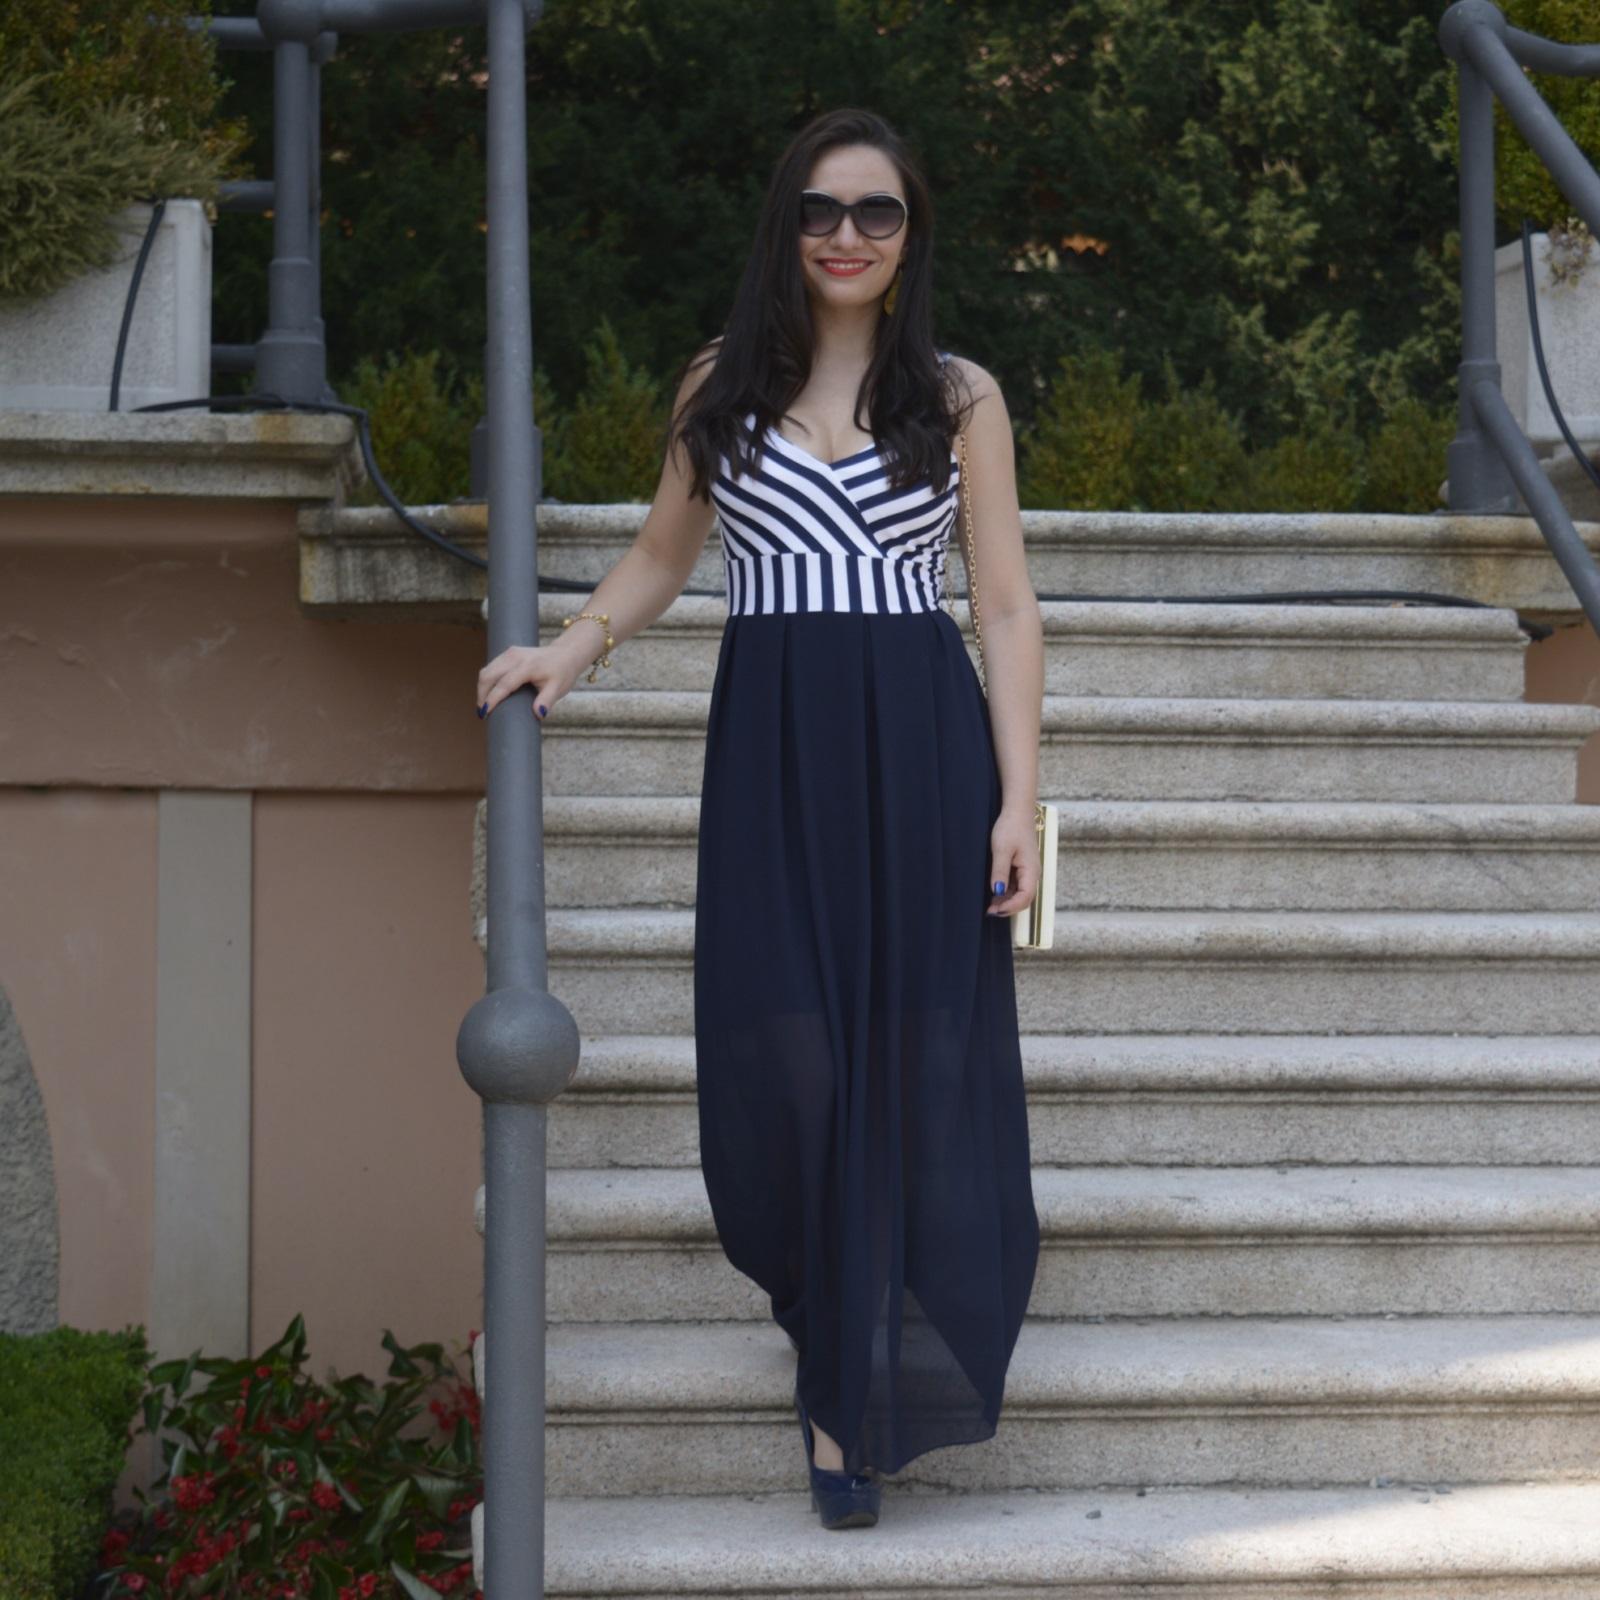 vestido-estilo-navy-longo-nathália-ferrara-16